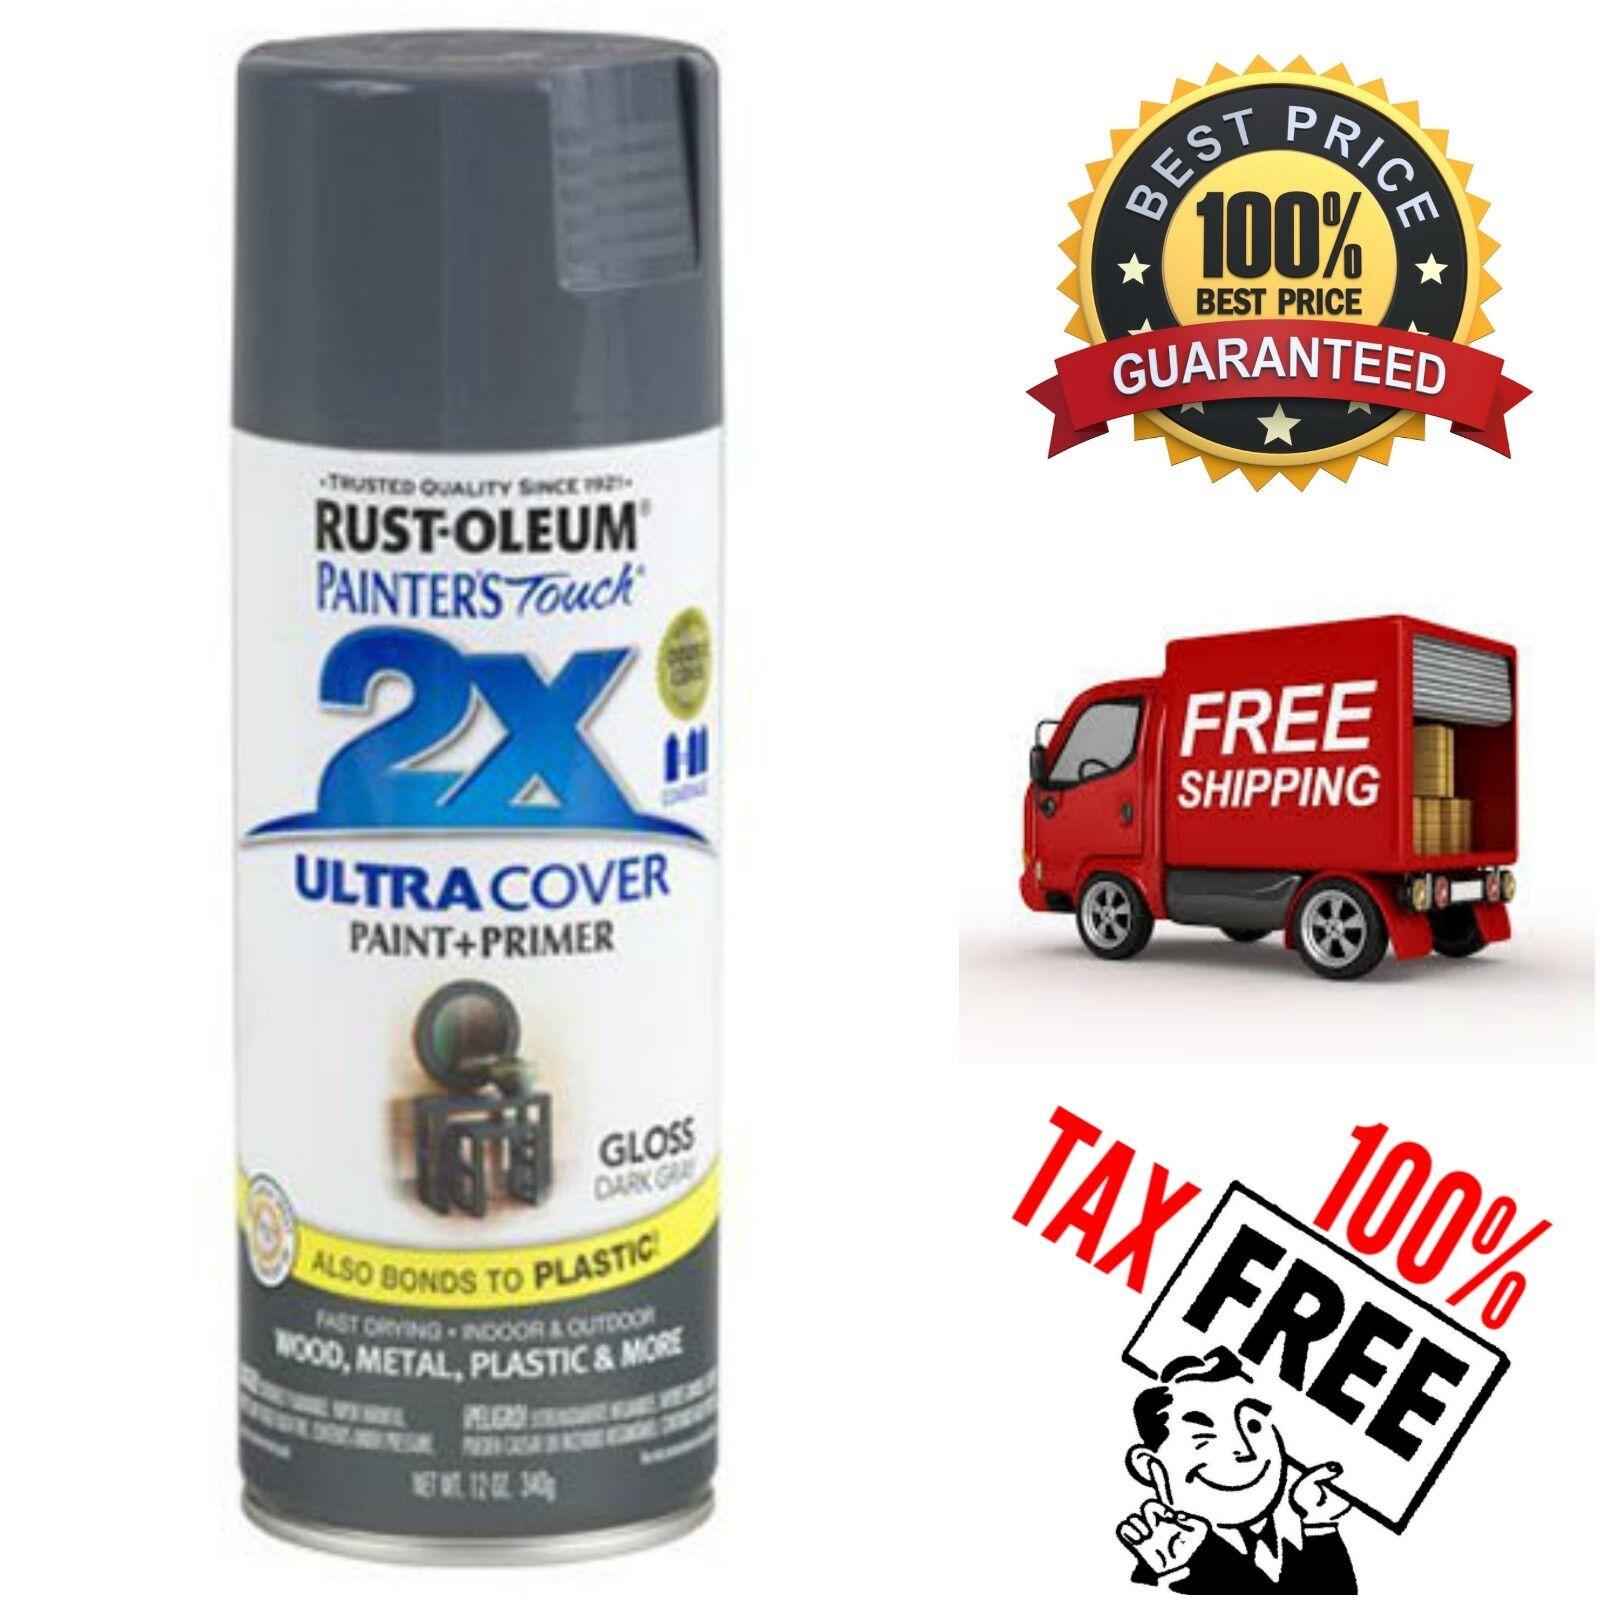 Rust-Oleum Multi Purpose Fast Drying Paint Primer Spray for